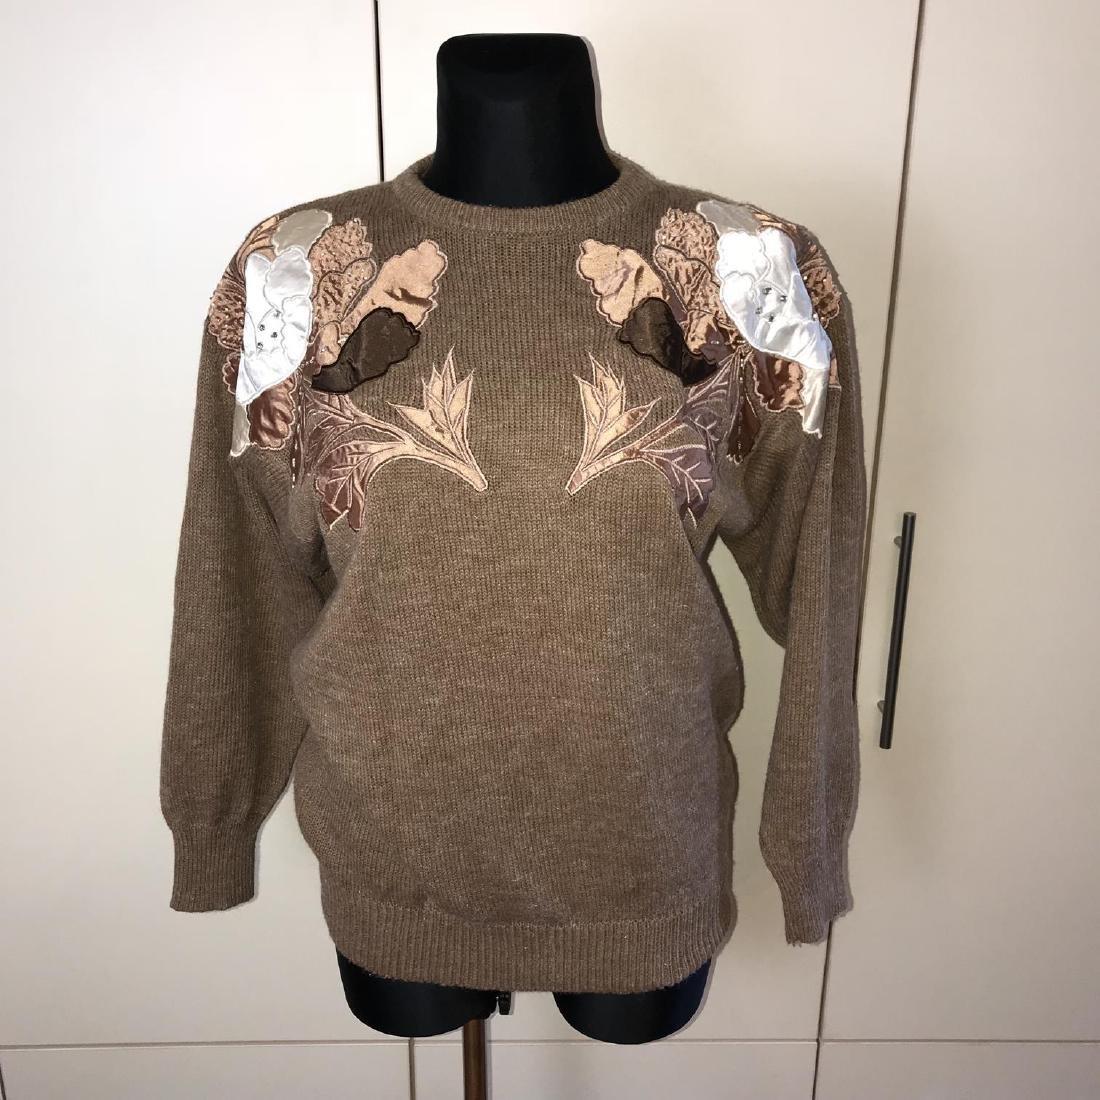 Vintage Women's Oversized Sweater Size EUR 40 US 10